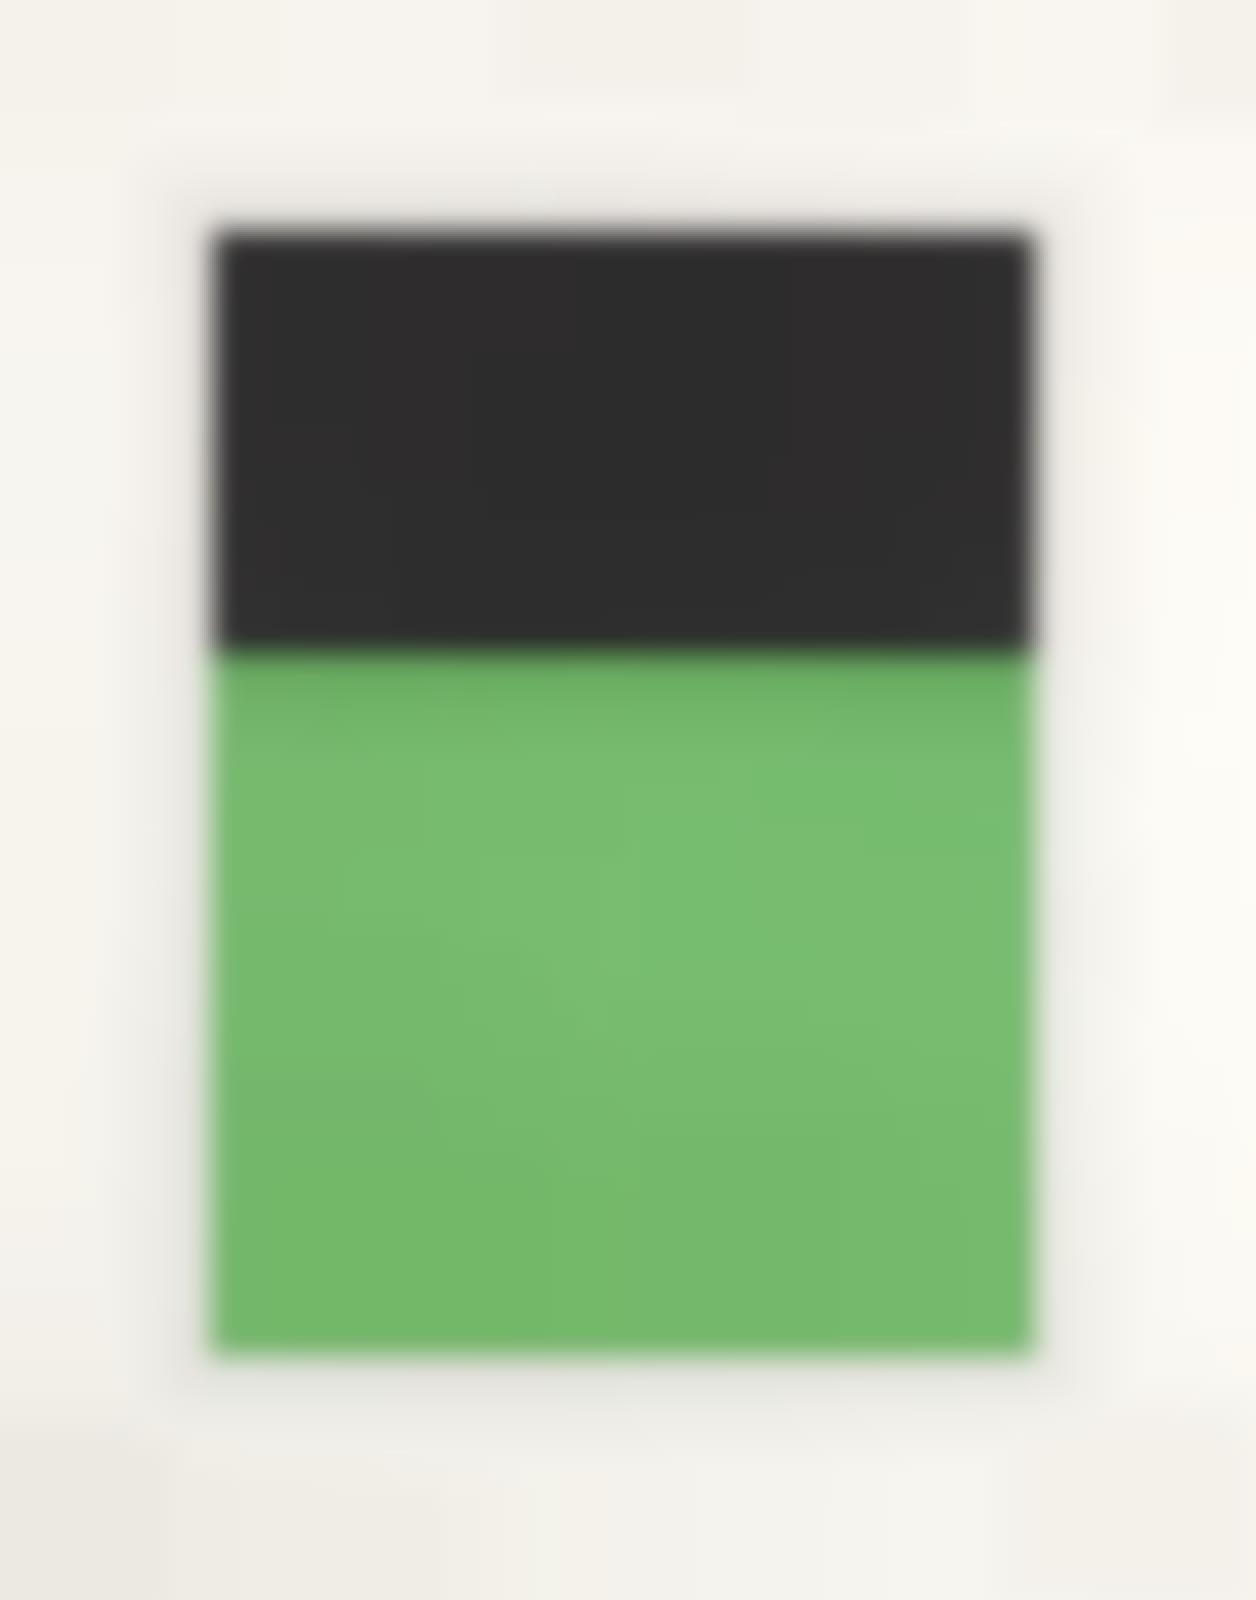 Ellsworth Kelly-Black/Green (A. 68; G. 237)-1970